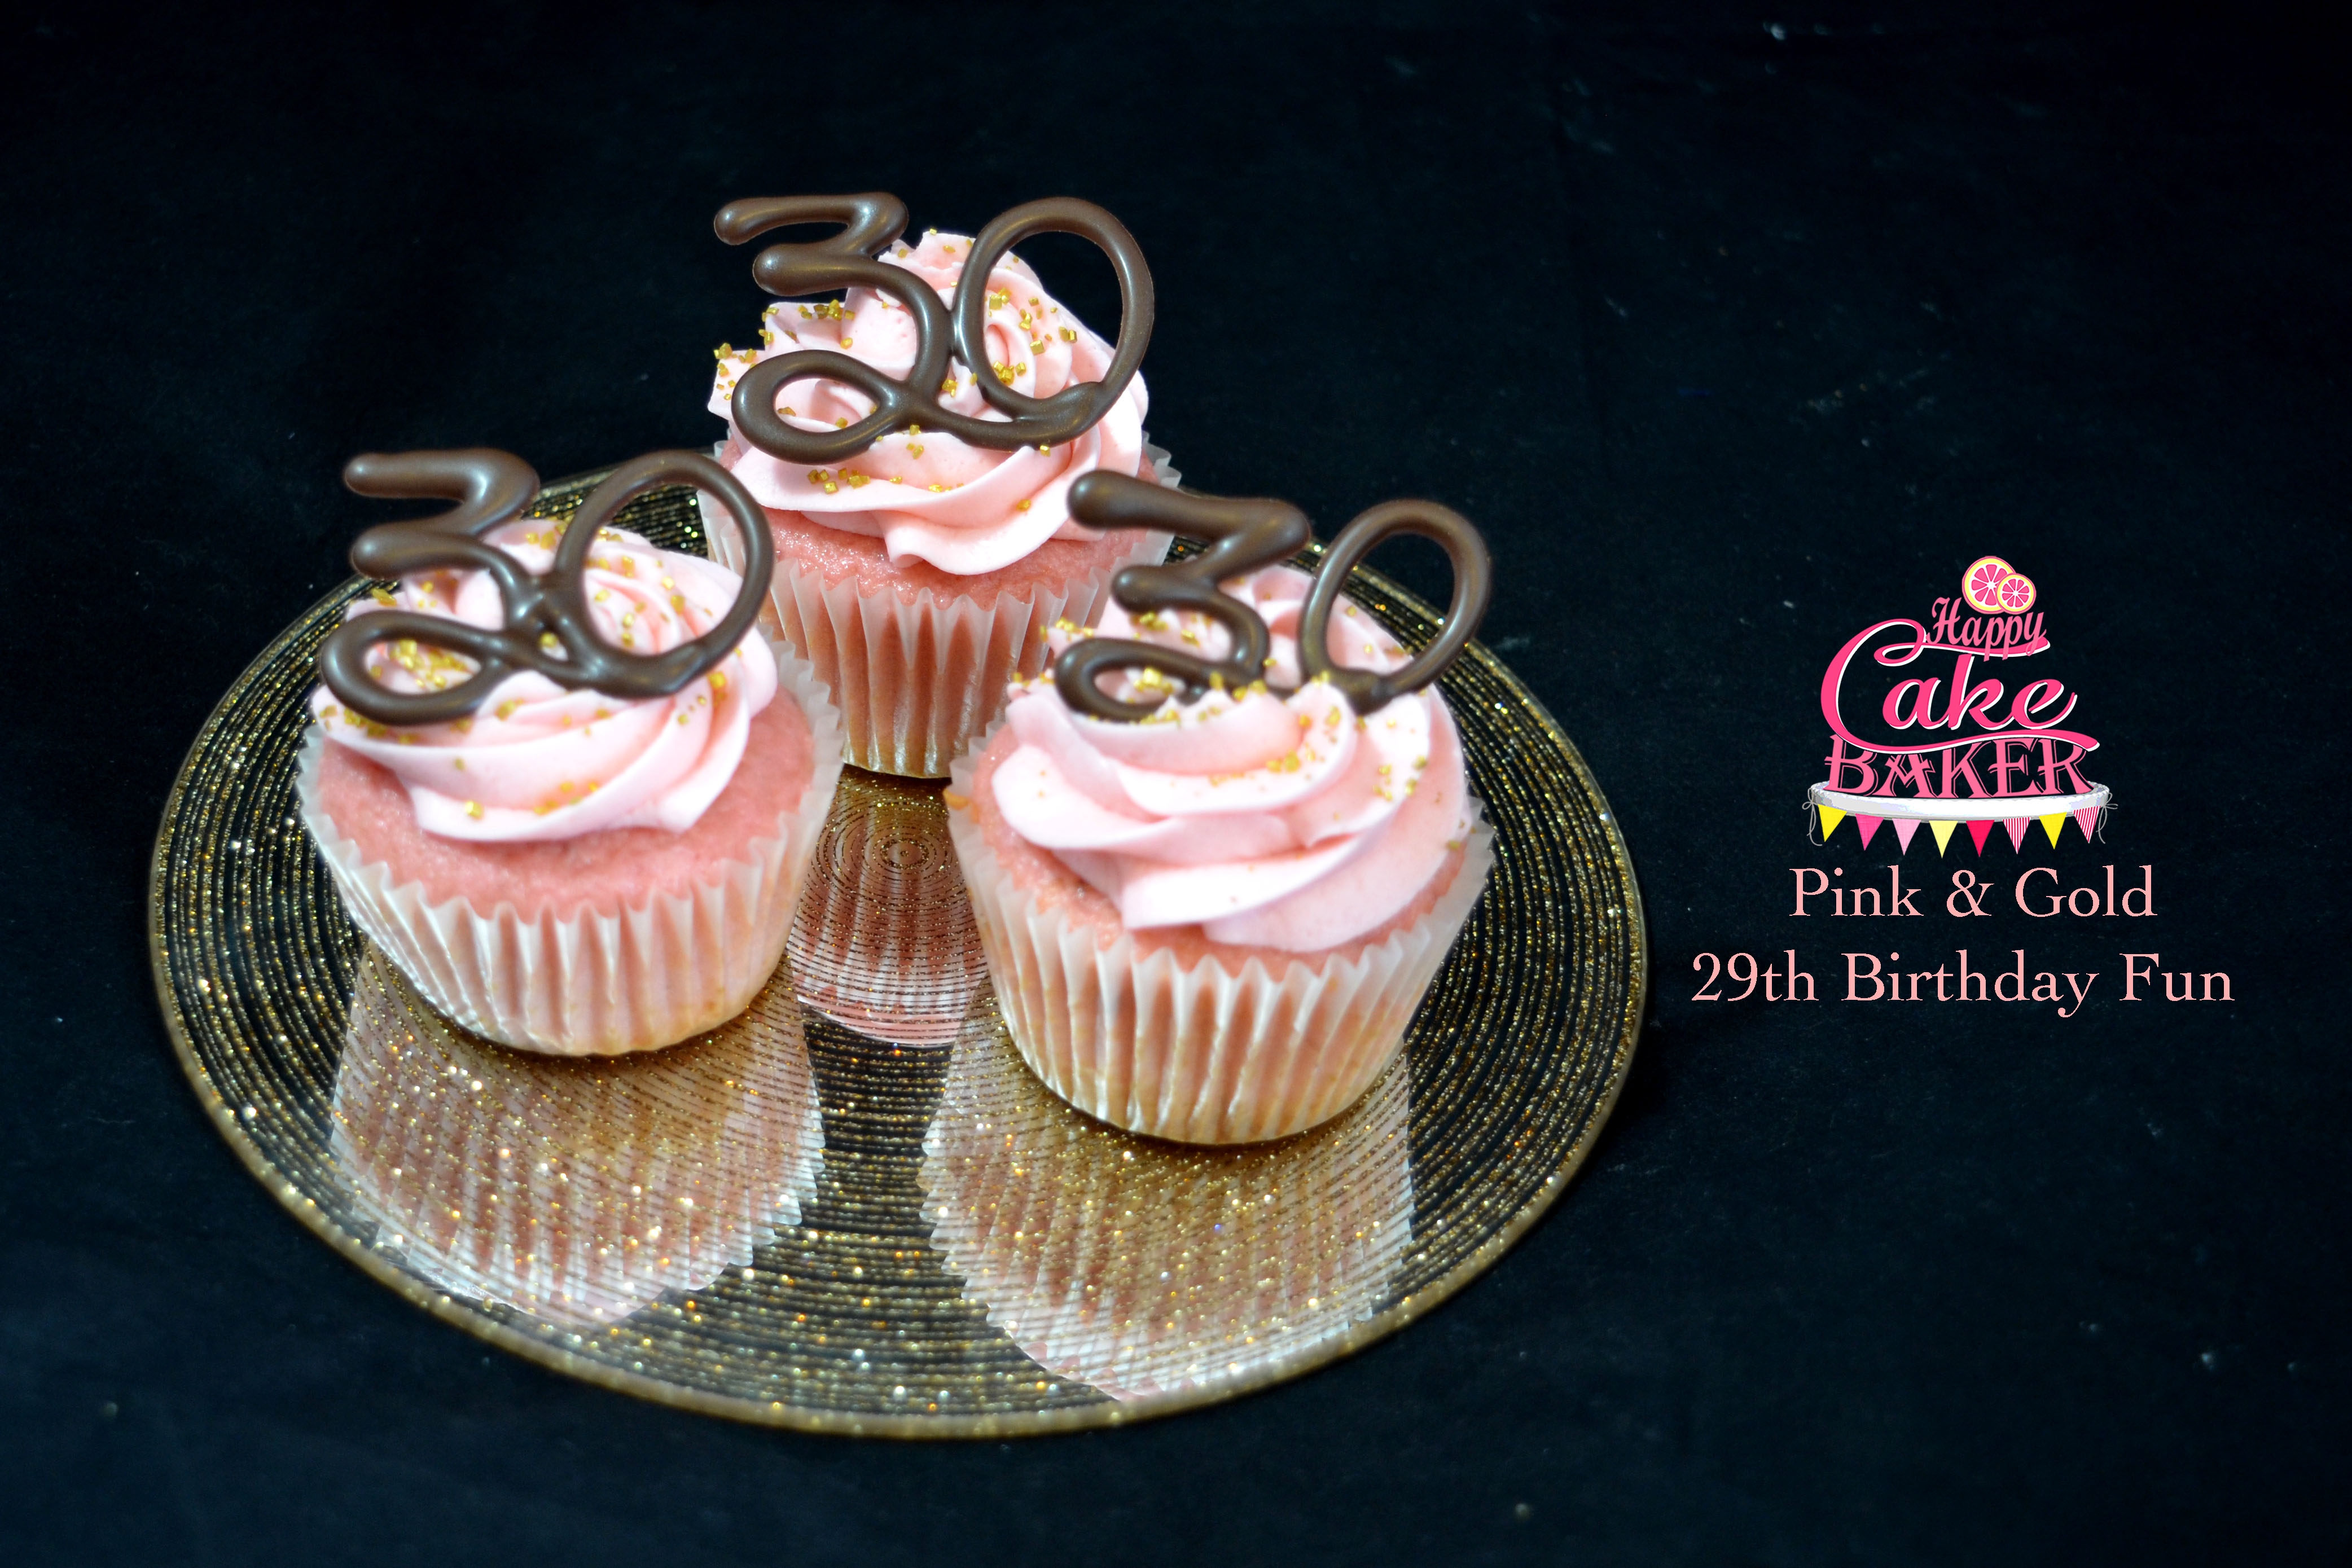 29th Birthday Fun Happy Cake Baker